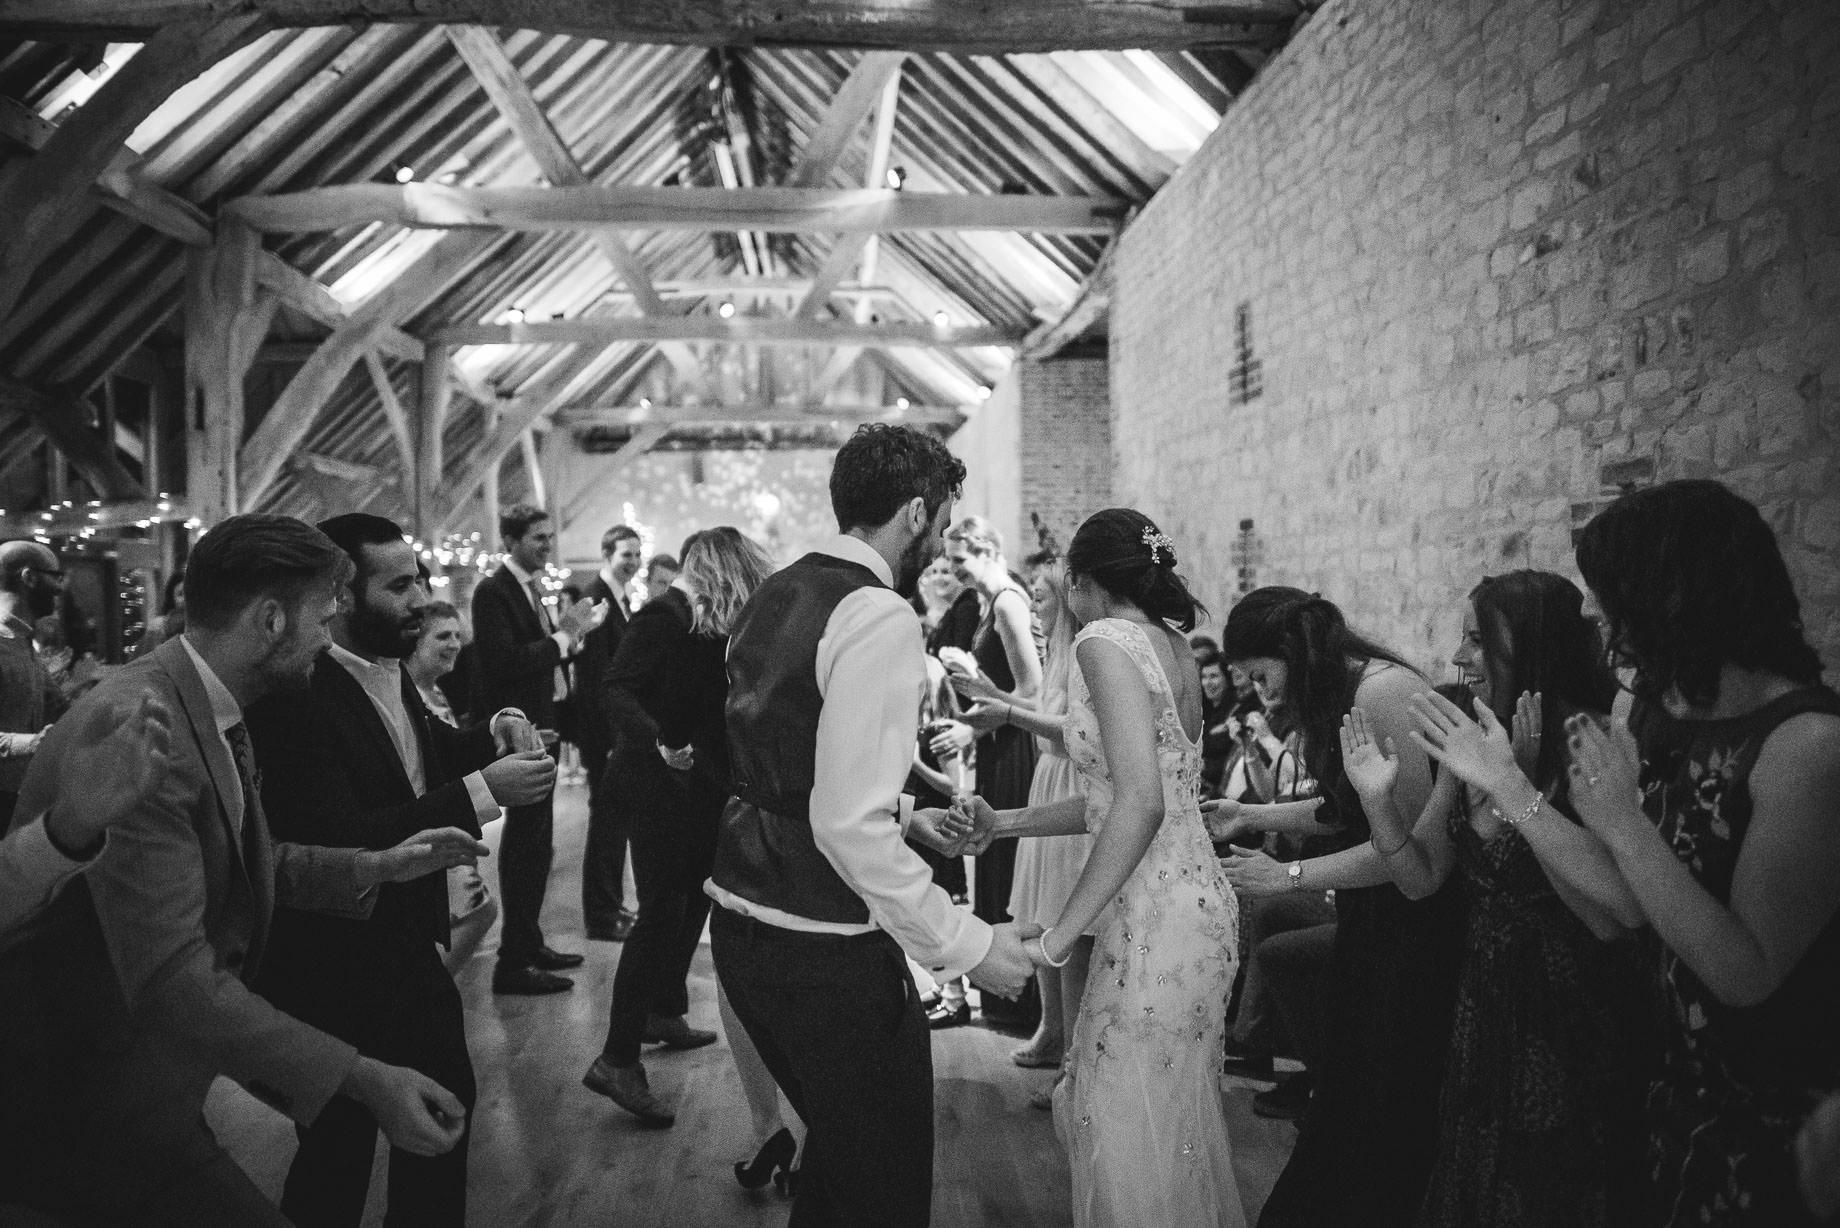 bury-court-barn-wedding-photography-guy-collier-photography-nadia-tom-183-of-184